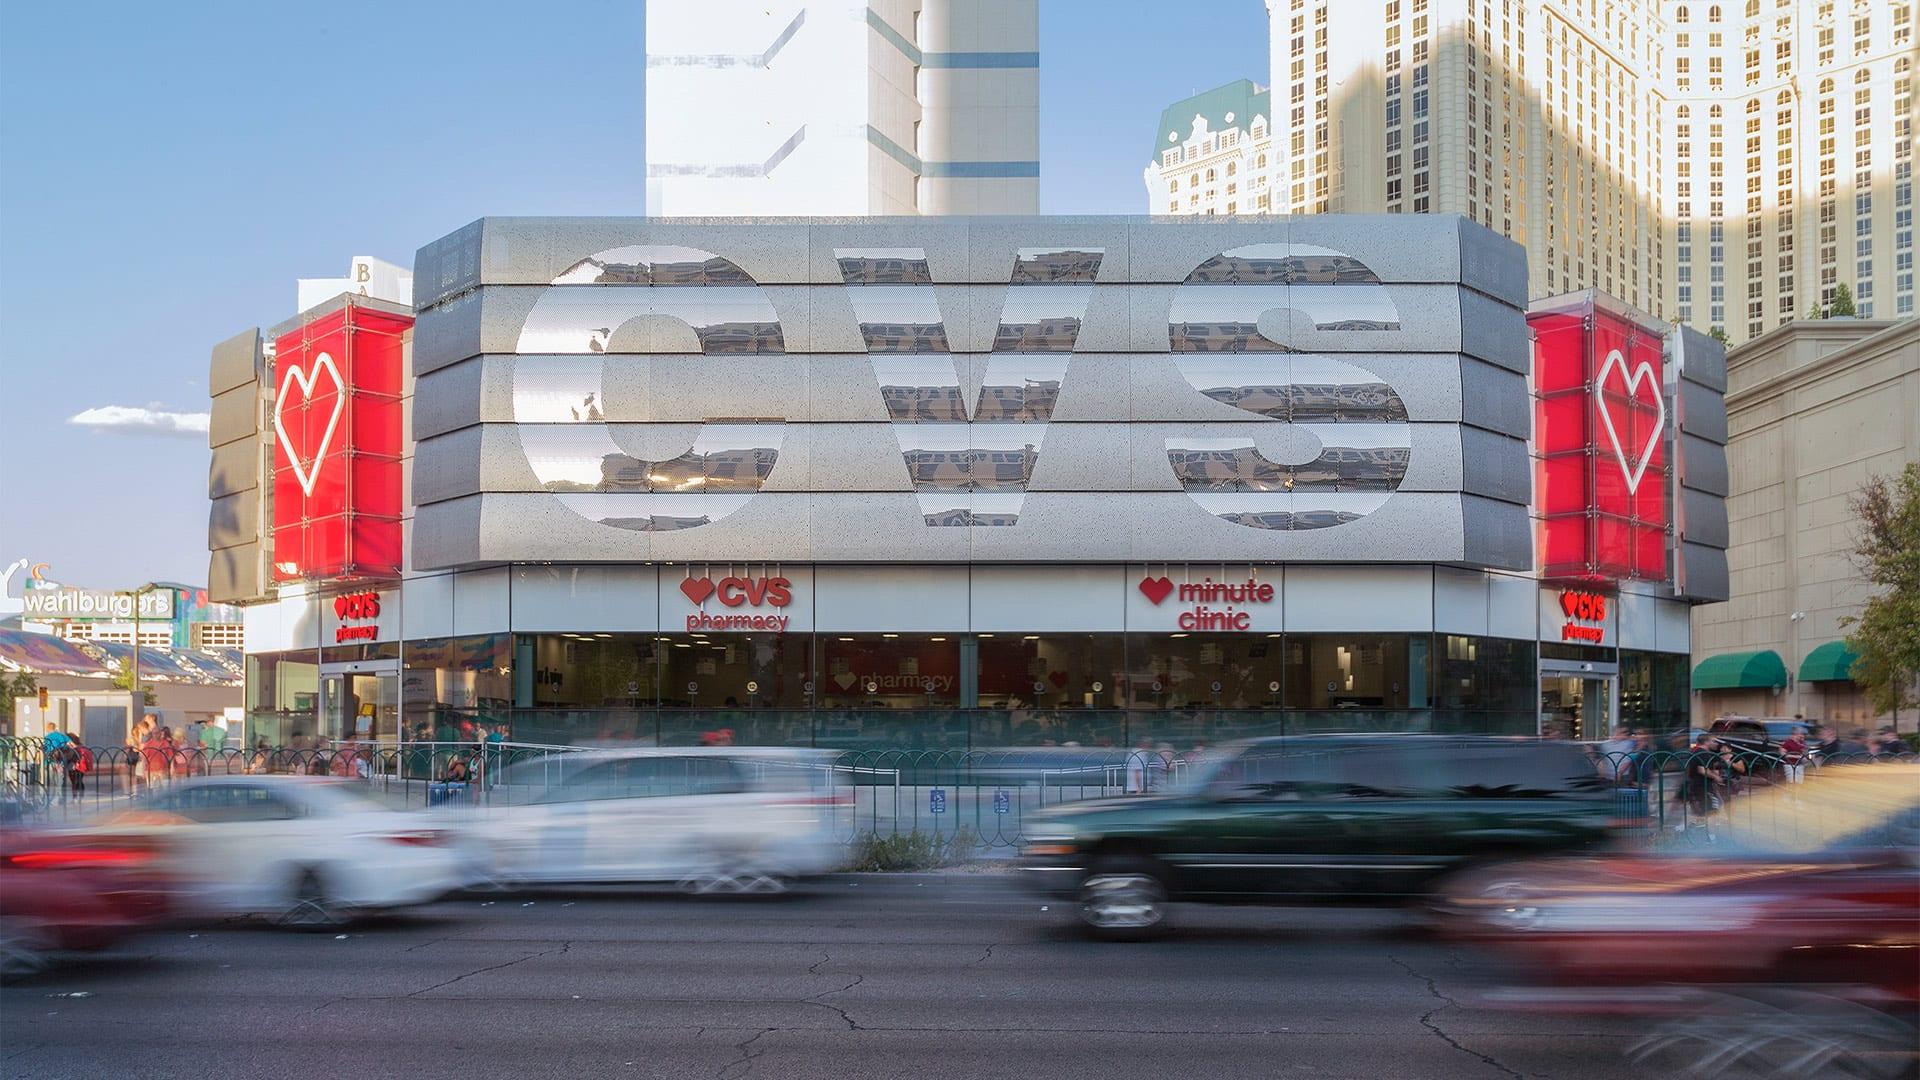 CVS Pharmacy at Bally's, Las Vegas